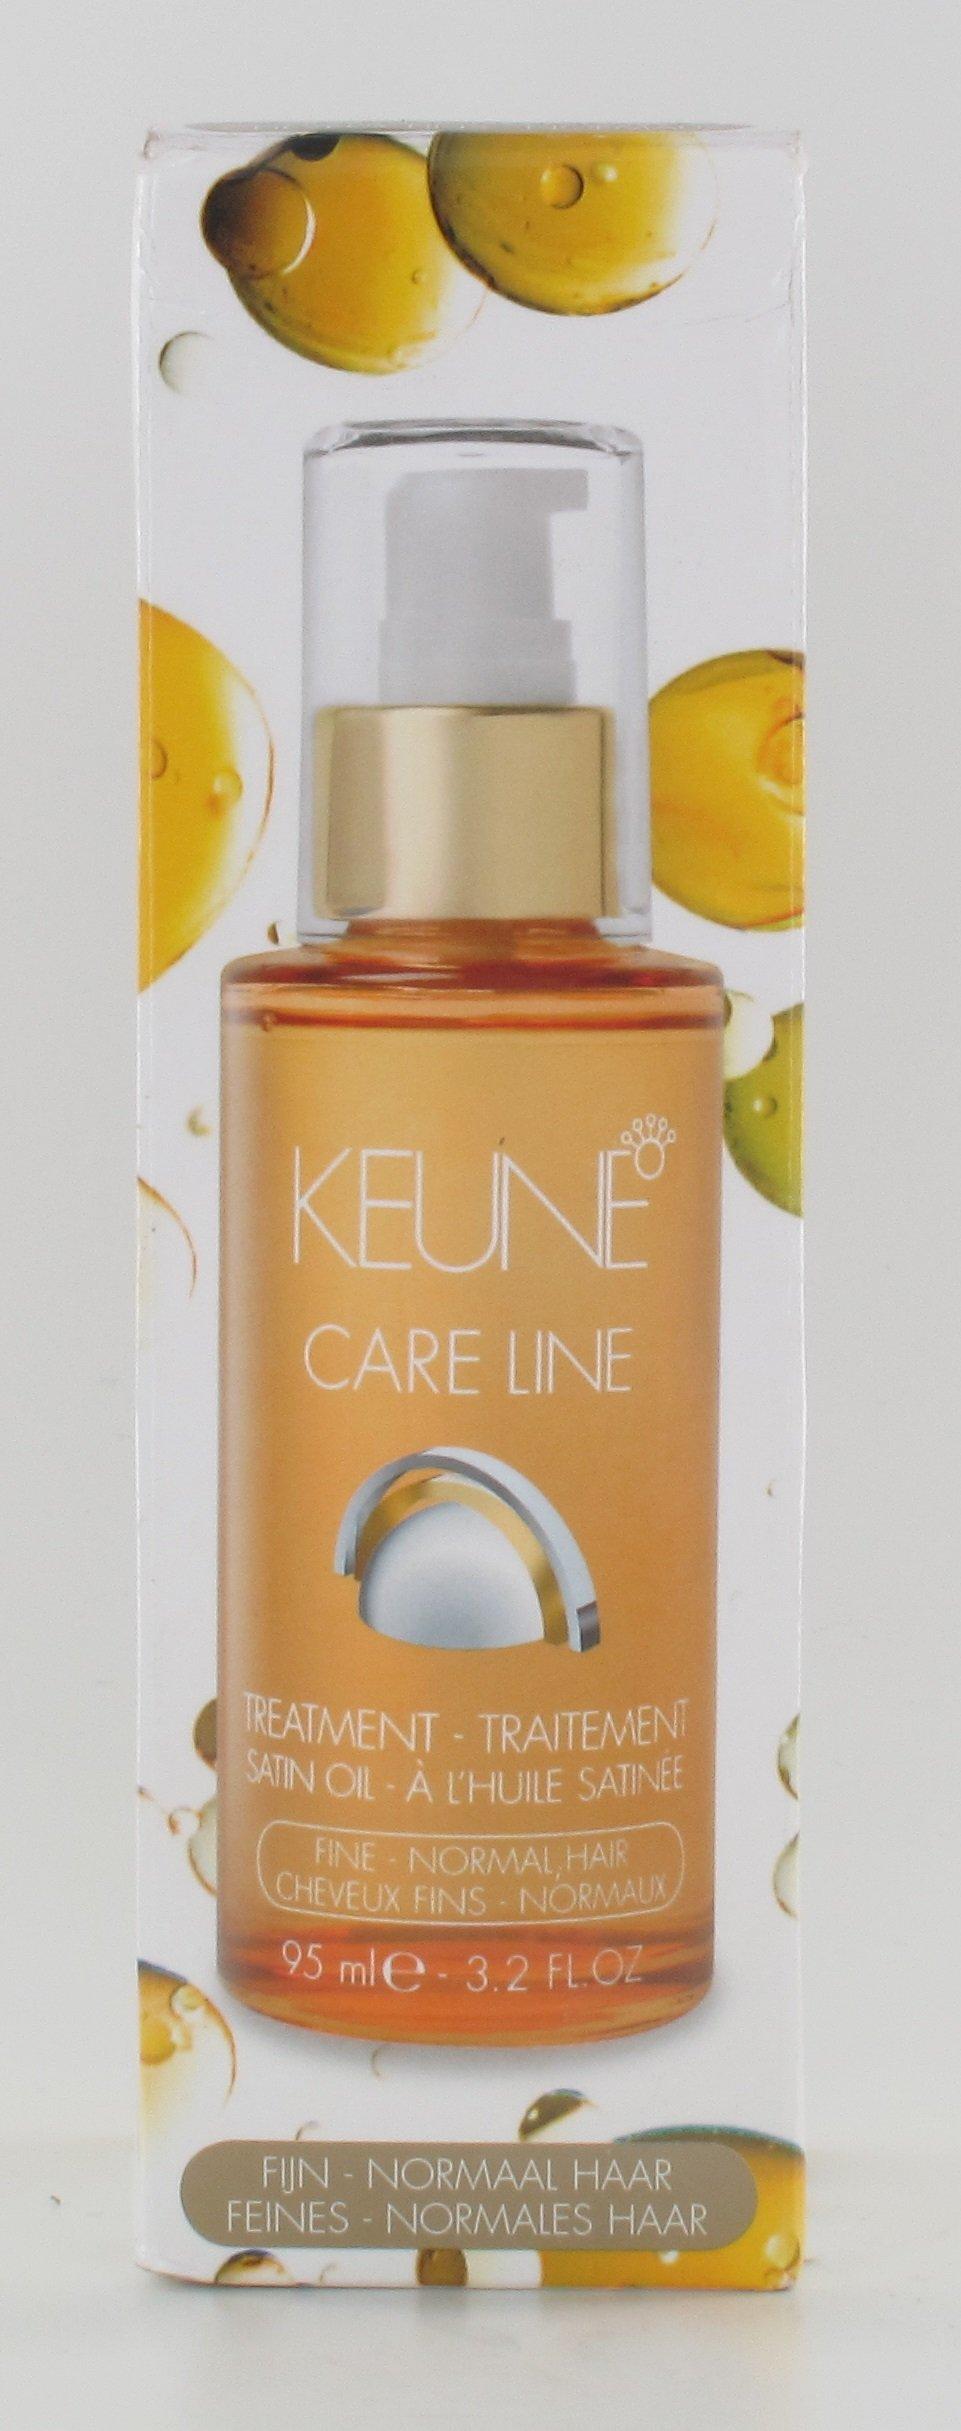 Keune Care Line Satin Oil Treatment For Fine-Normal Hair 3.2oz